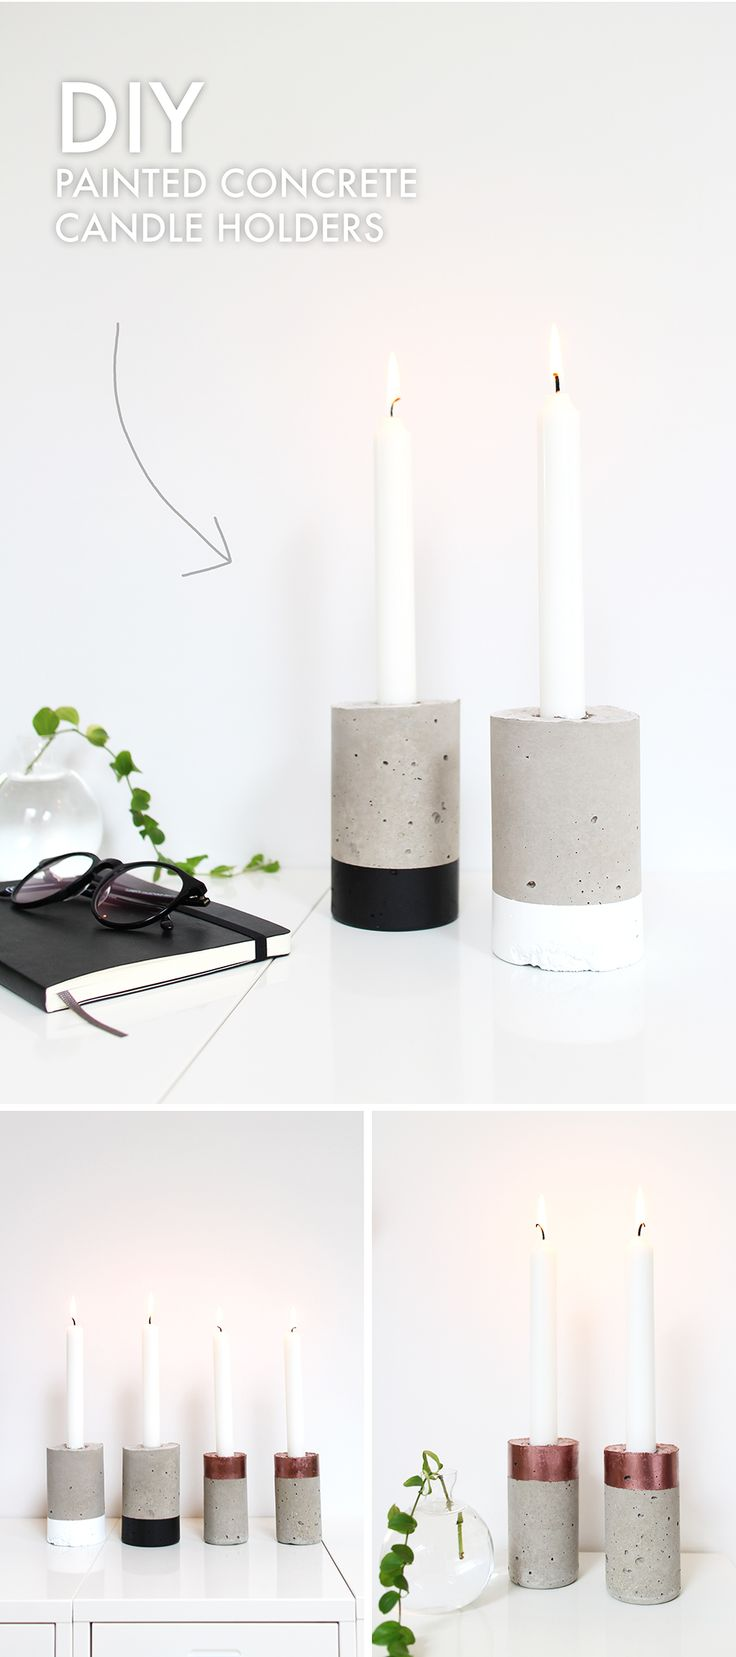 SOFIAMILK - DIY // målade ljusstakar i betong. Concrete candle holders.   http://sofiamilk.se/2015/september/diy-malade-ljusstakar-i-betong-2.html